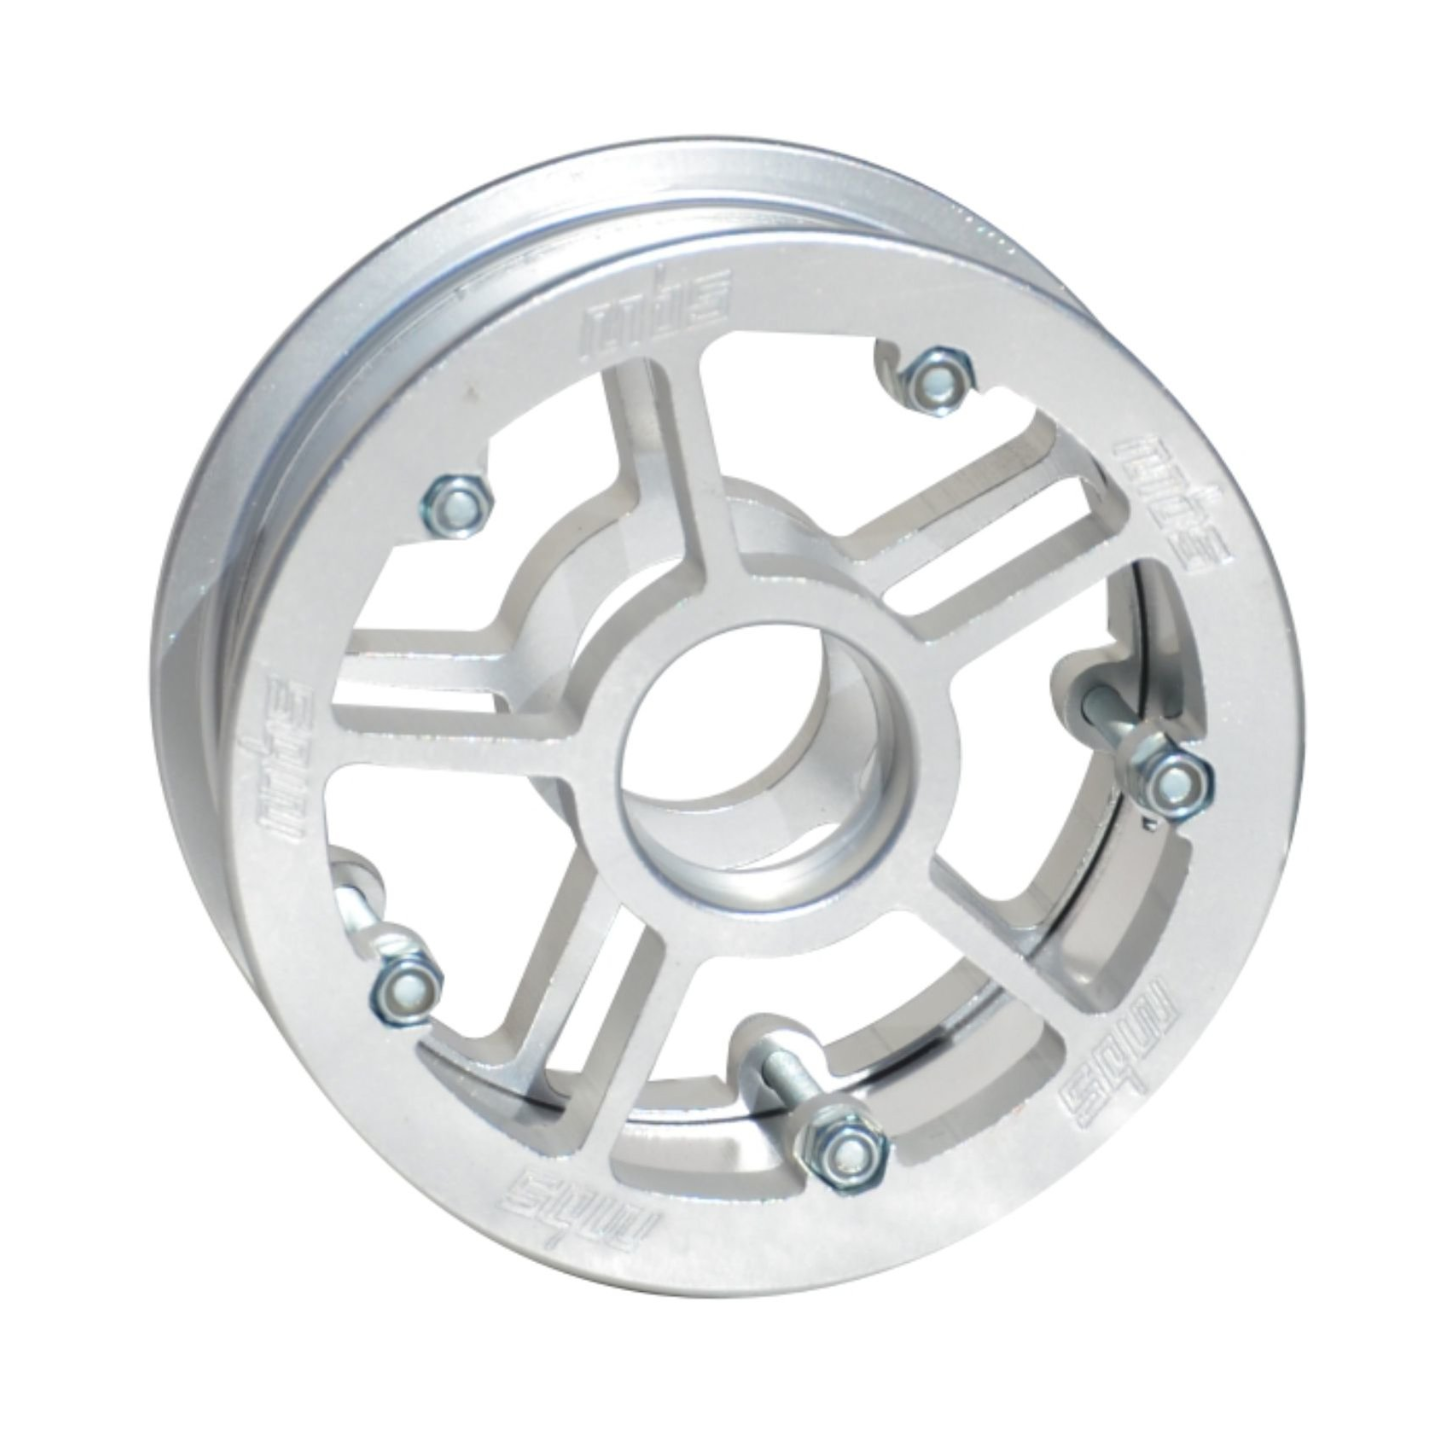 Image of MBS Rockstar Pro Hub - Silver (1)